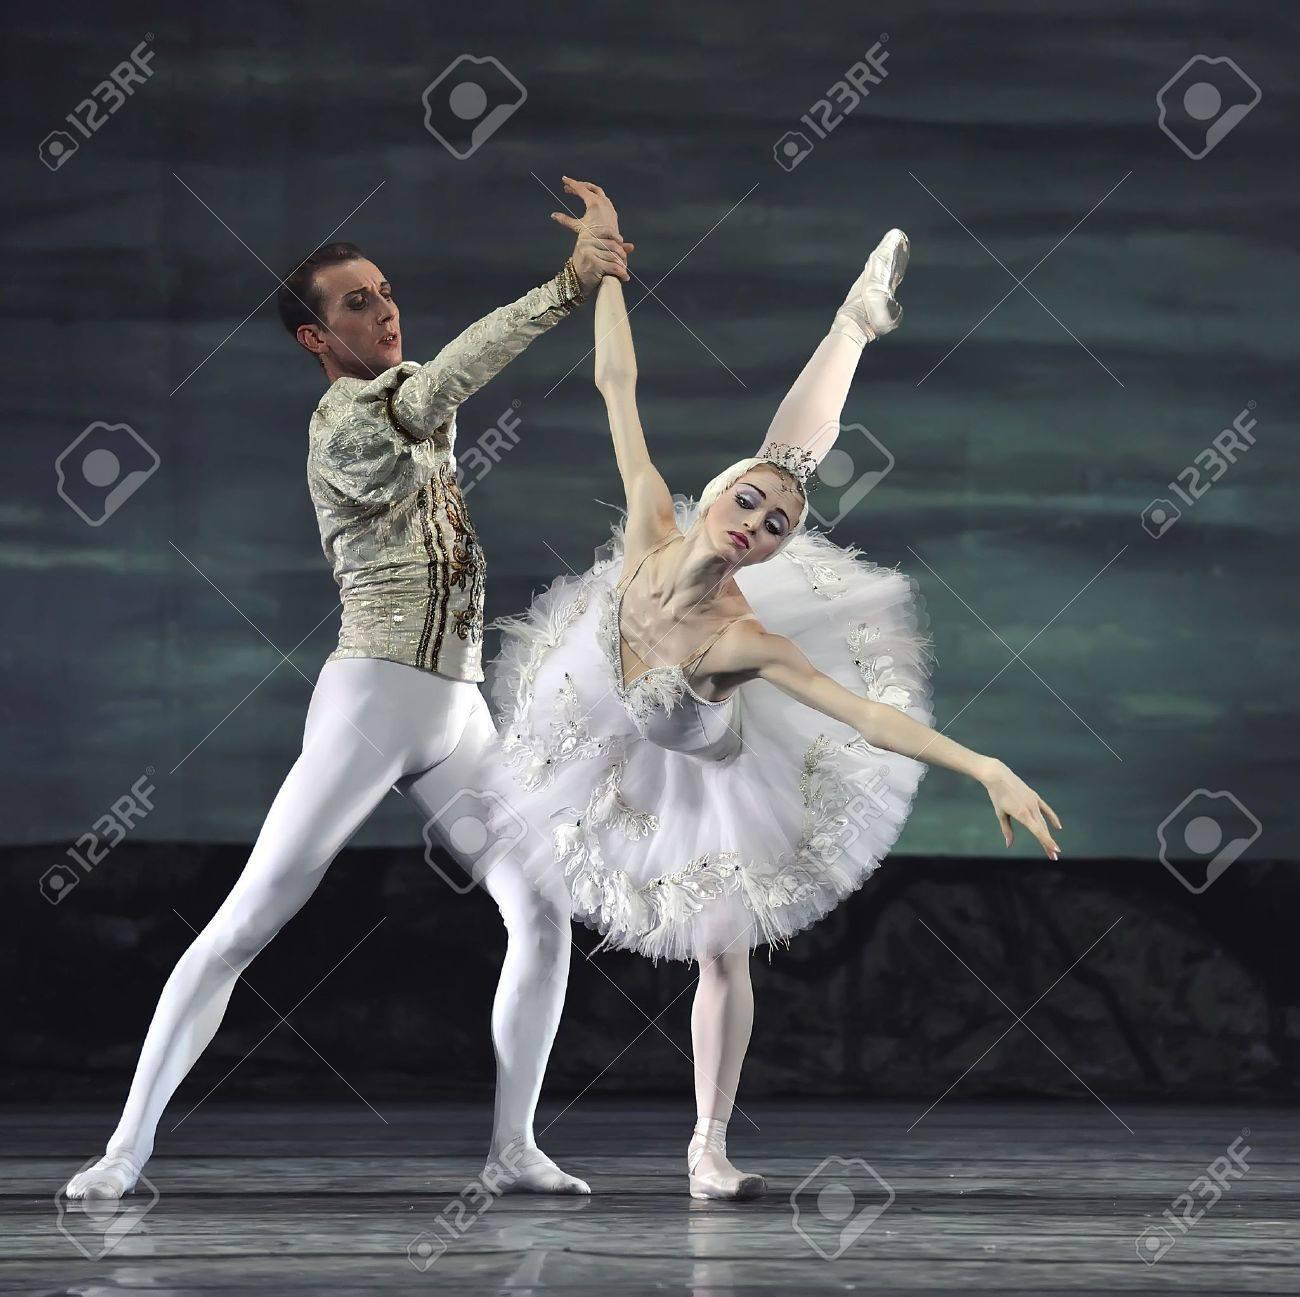 Russian royal ballet perform Swan Lake ballet at Jinsha theatre December 24, 2008 in Chengdu, China. Stock Photo - 8151481